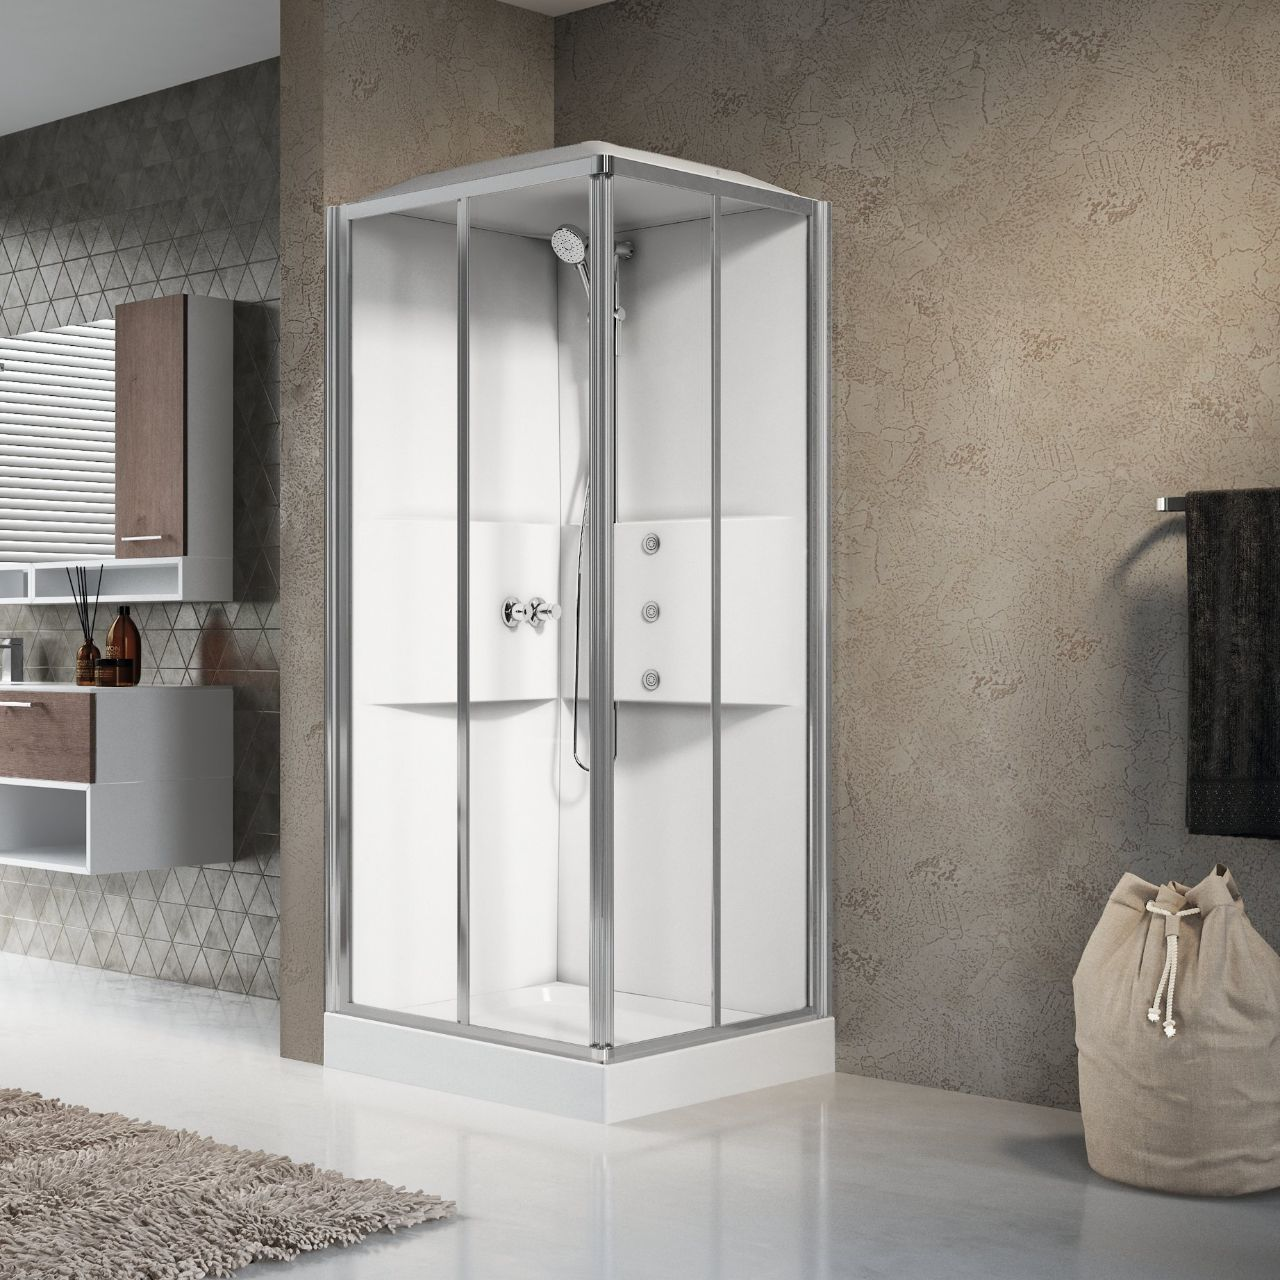 cabine doccia media 2 0 a80 novellini. Black Bedroom Furniture Sets. Home Design Ideas